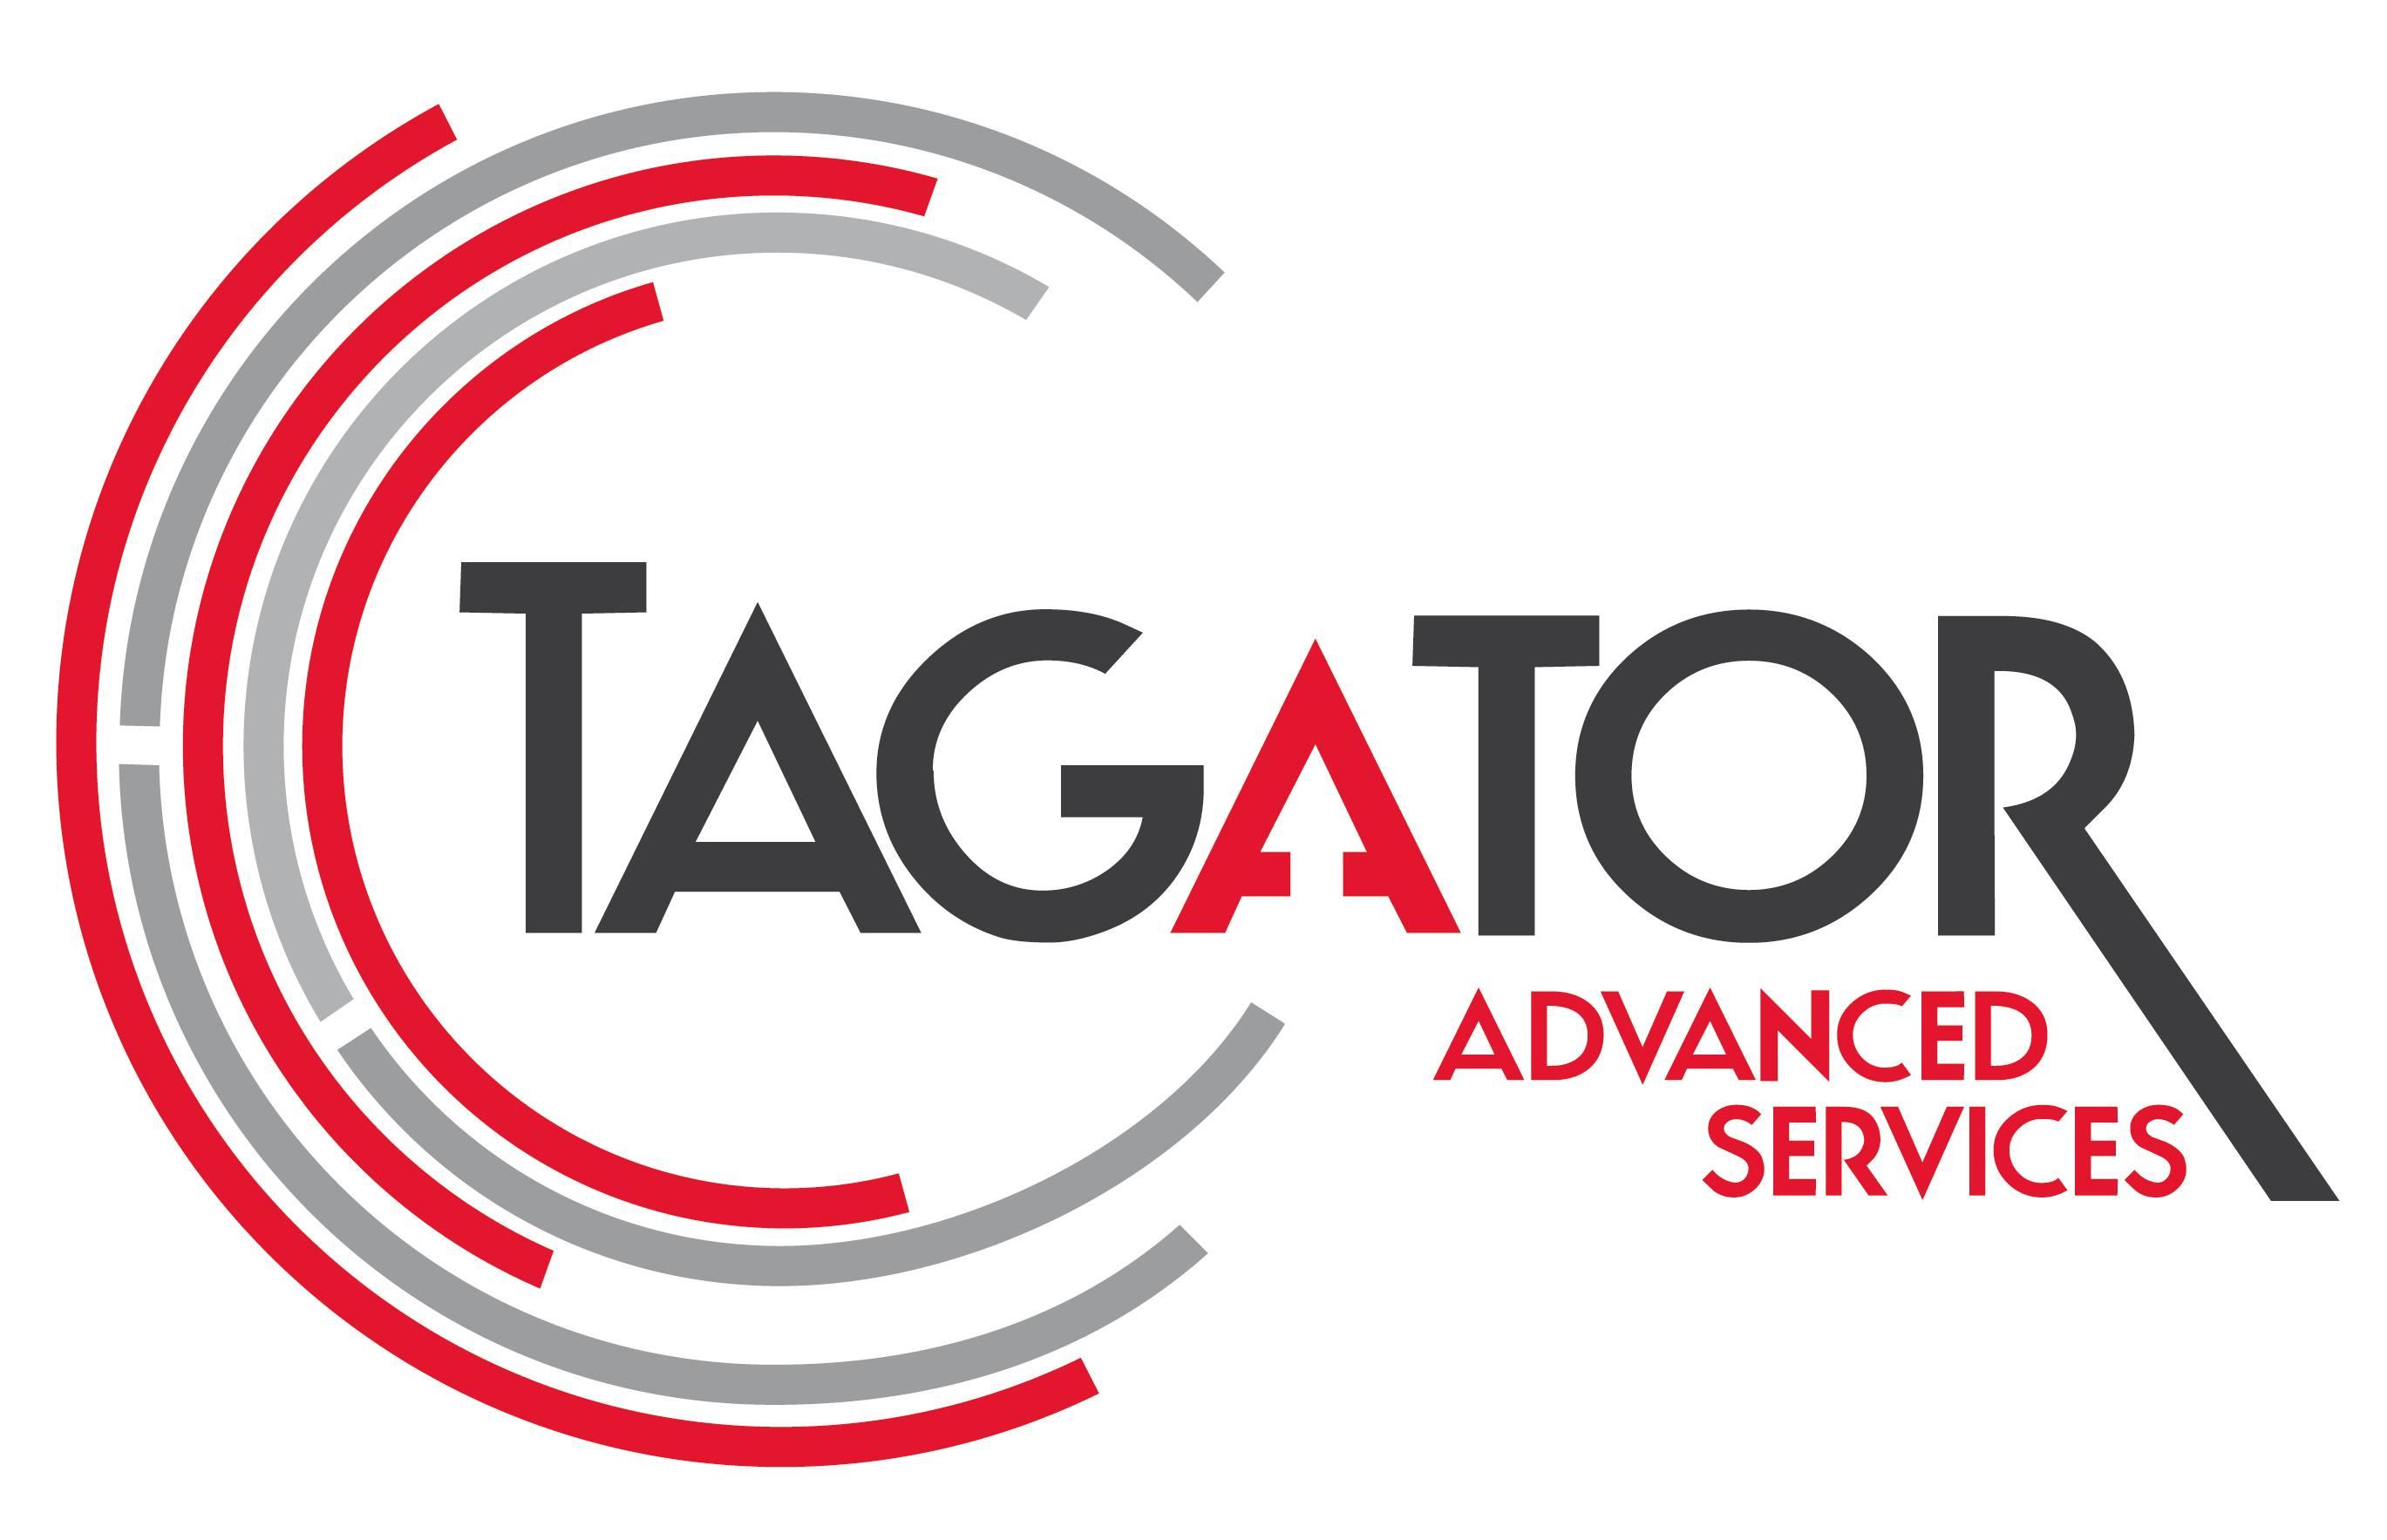 Tagator